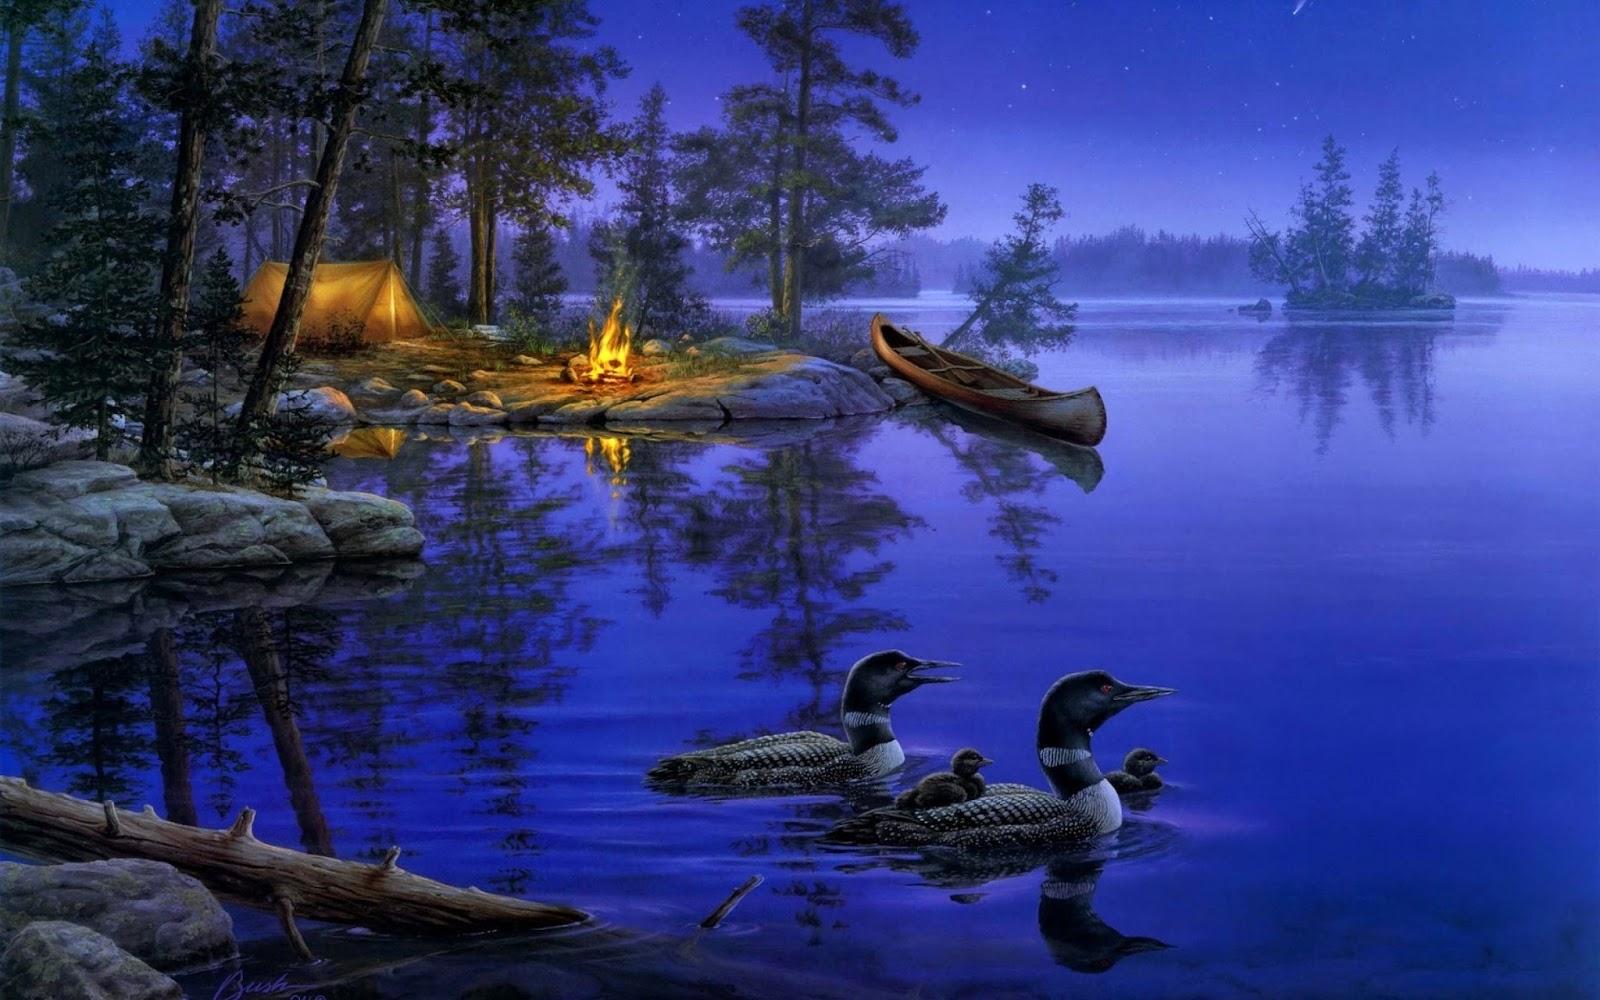 Top Wallpaper Night Love - good%2Bnight%2Bhd%2Bwallpaper  Graphic-825111.jpg